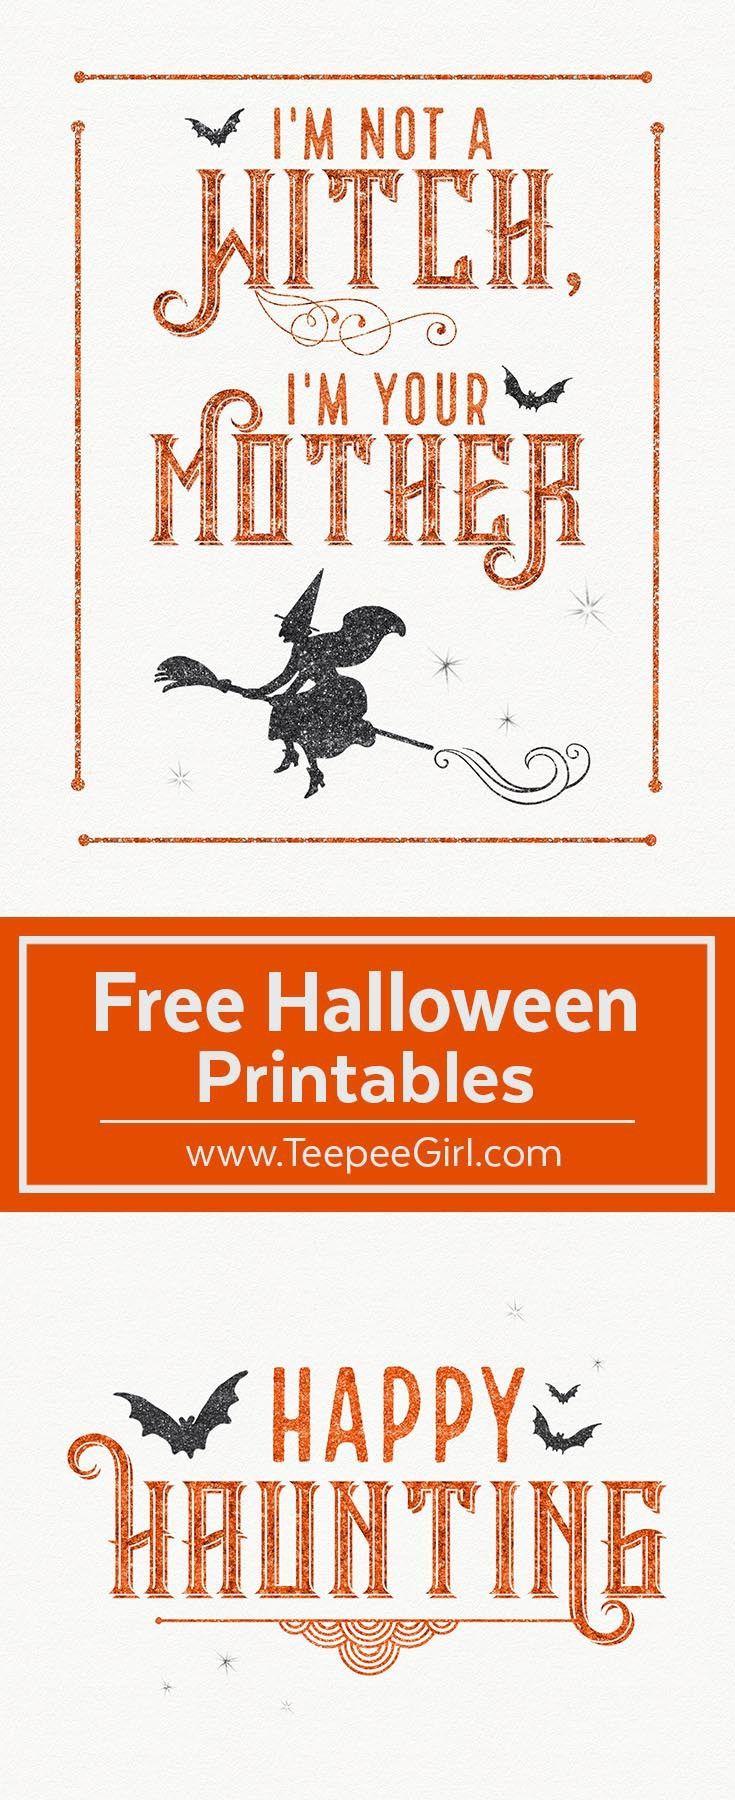 Free Halloween Printables Halloween Printables Free Free Halloween Halloween Printables